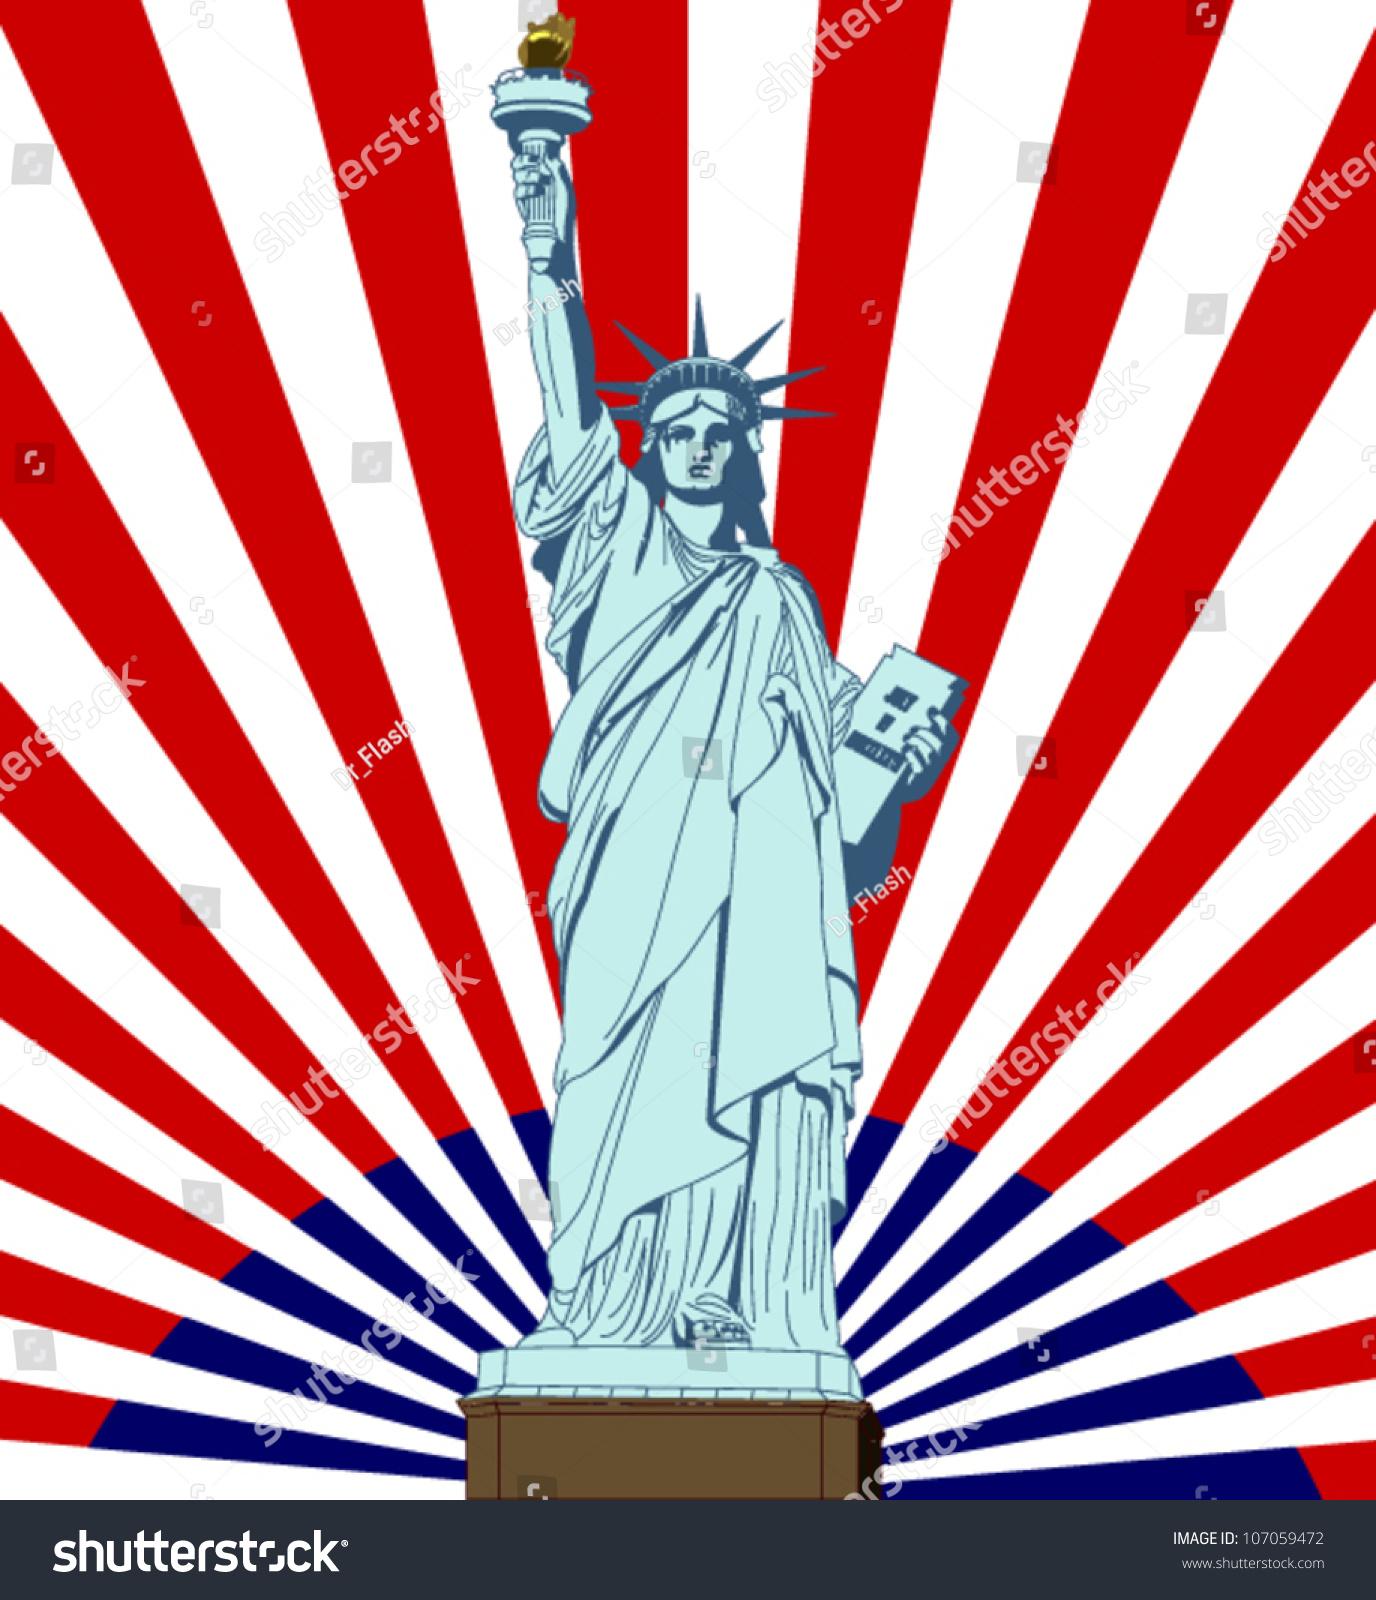 Statue liberty new york landmark symbol stock vector 107059472 new york landmark and symbol of freedom and democracy biocorpaavc Images